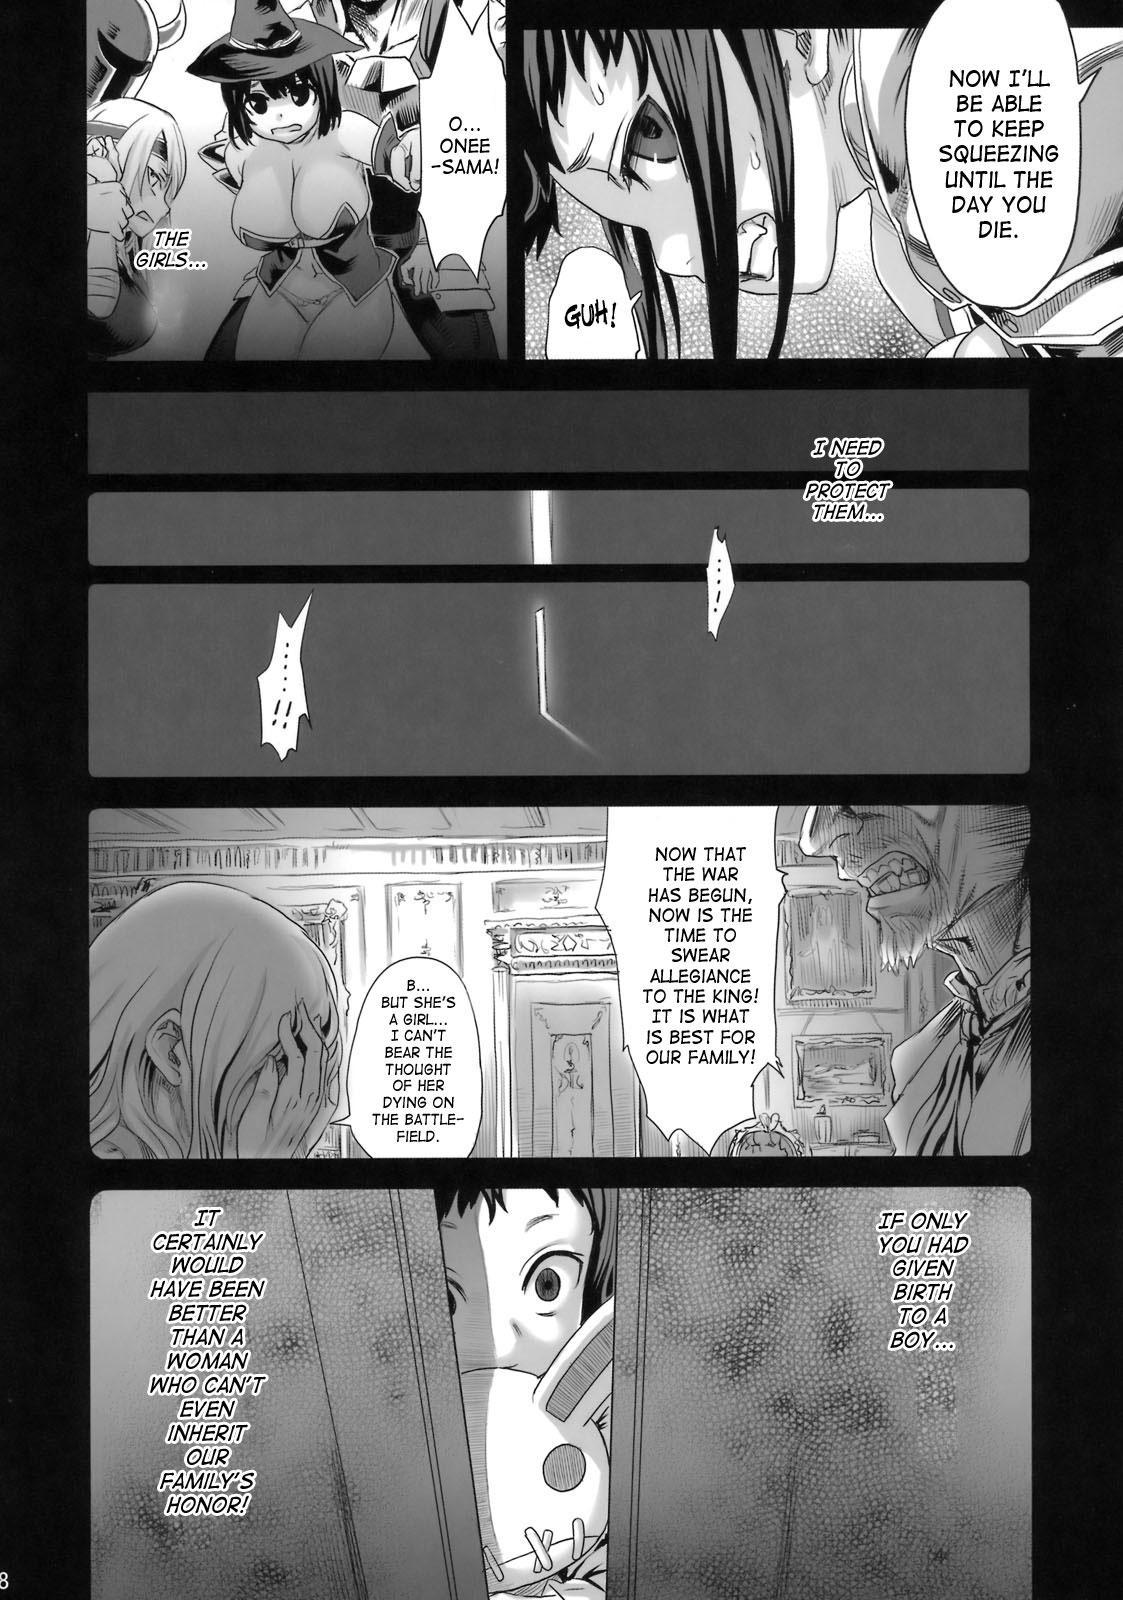 (C76) [Fatalpulse (Asanagi)] Victim Girls 7 - Jaku Niku Kyoushoku Dog-eat-Bitch (Fantasy Earth Zero) [English] [SaHa] 6